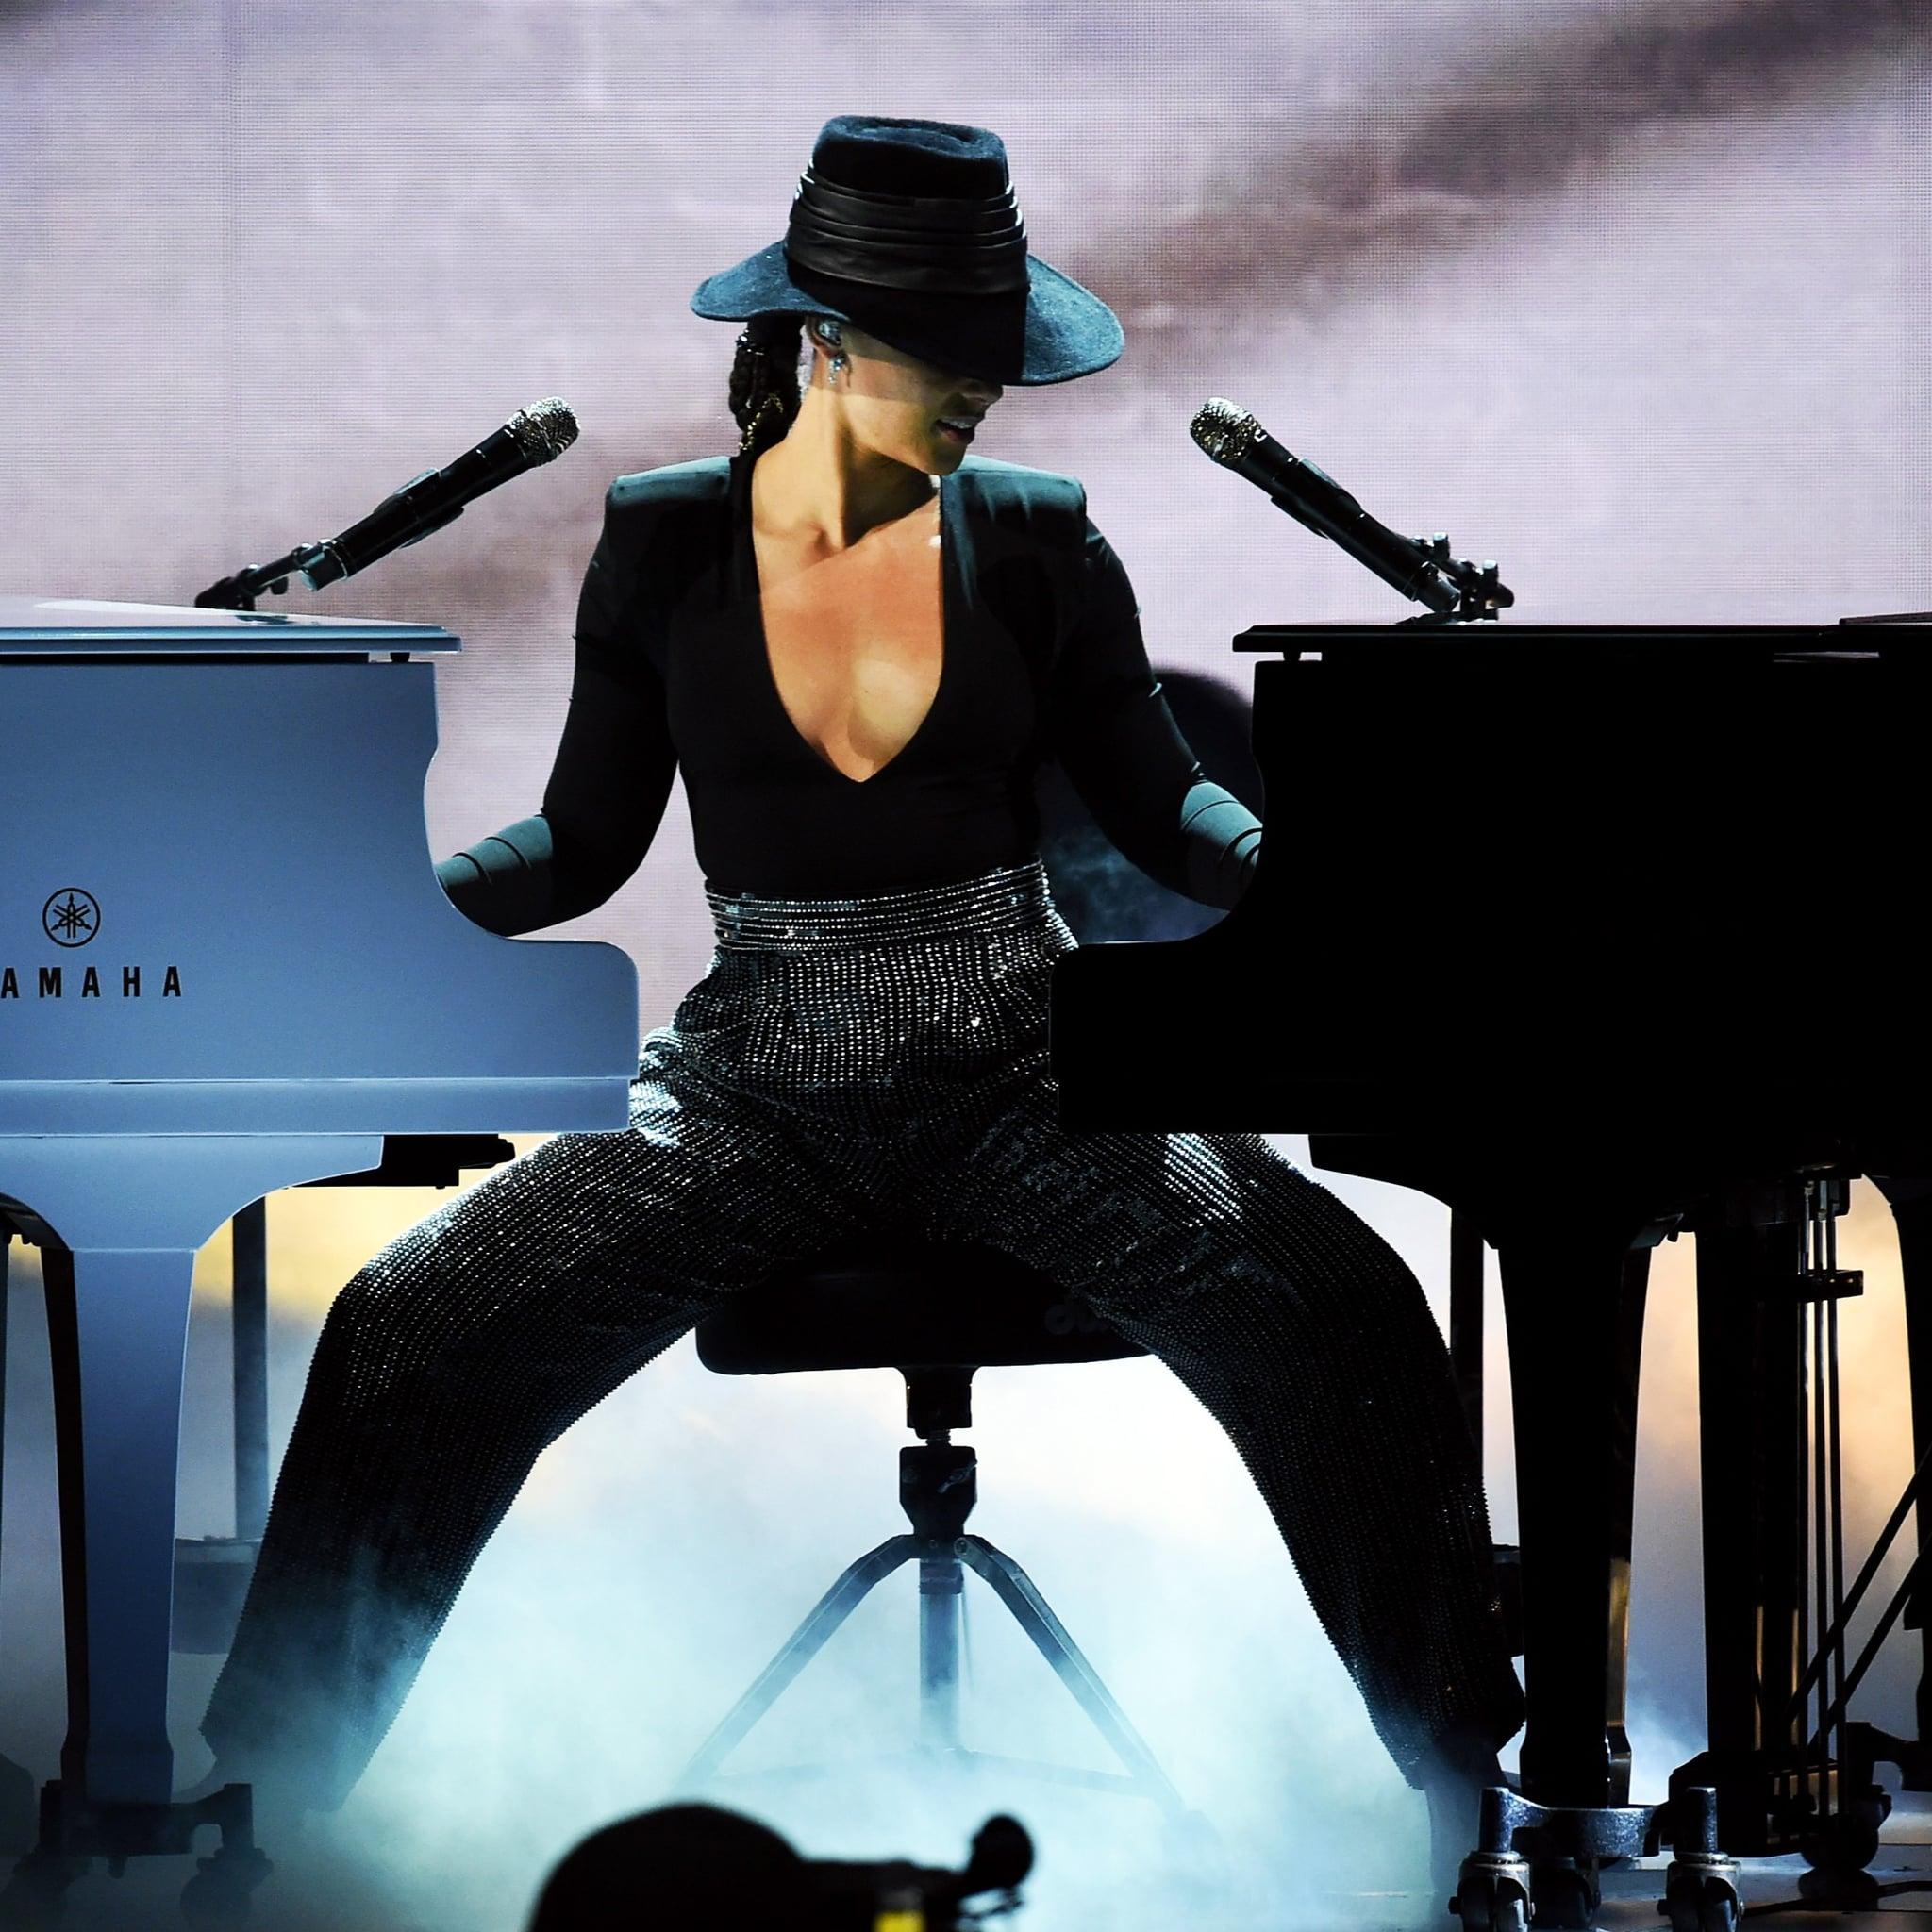 Alicia-Keys-Piano-Performance-2019-Grammy-Awards.jpg